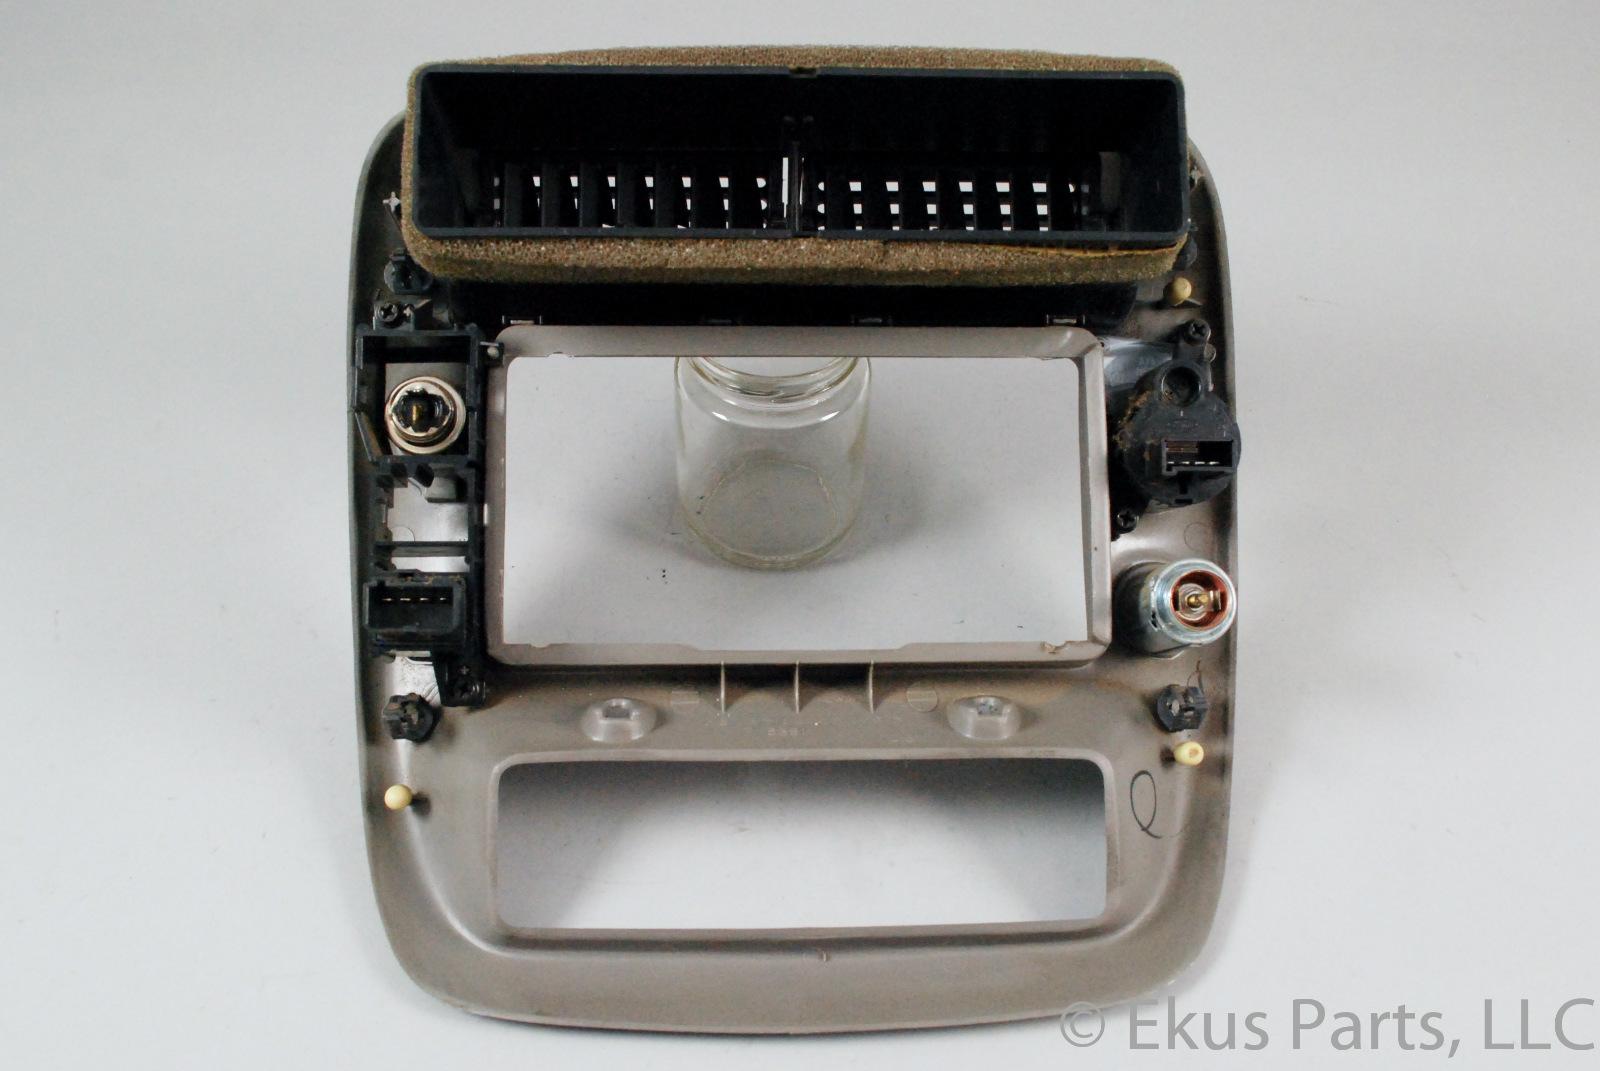 2003 Ford Explorer Radio Wiring